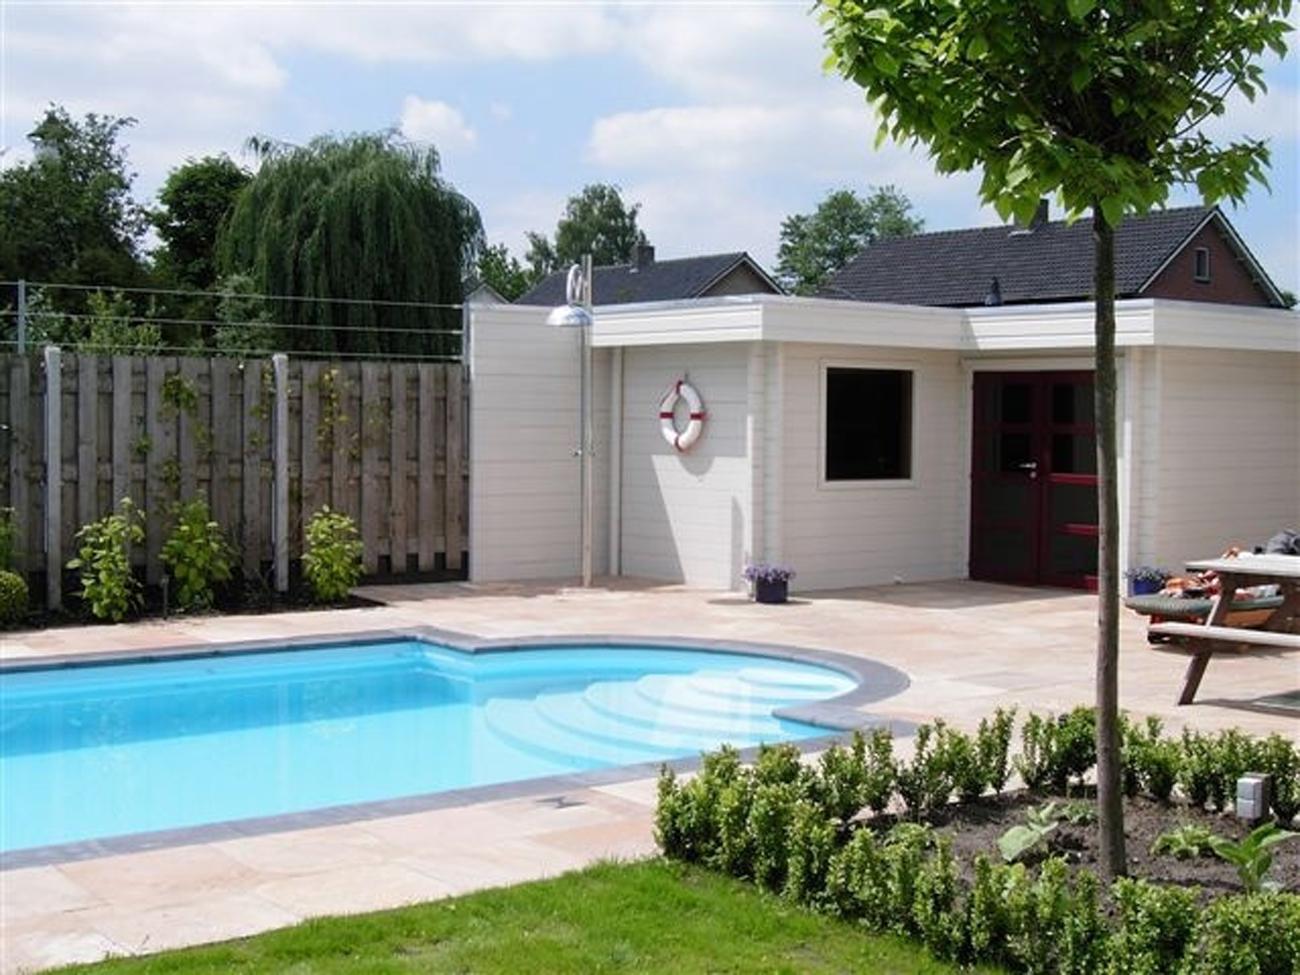 Gamme modern lorenne contructions for Photo local technique piscine